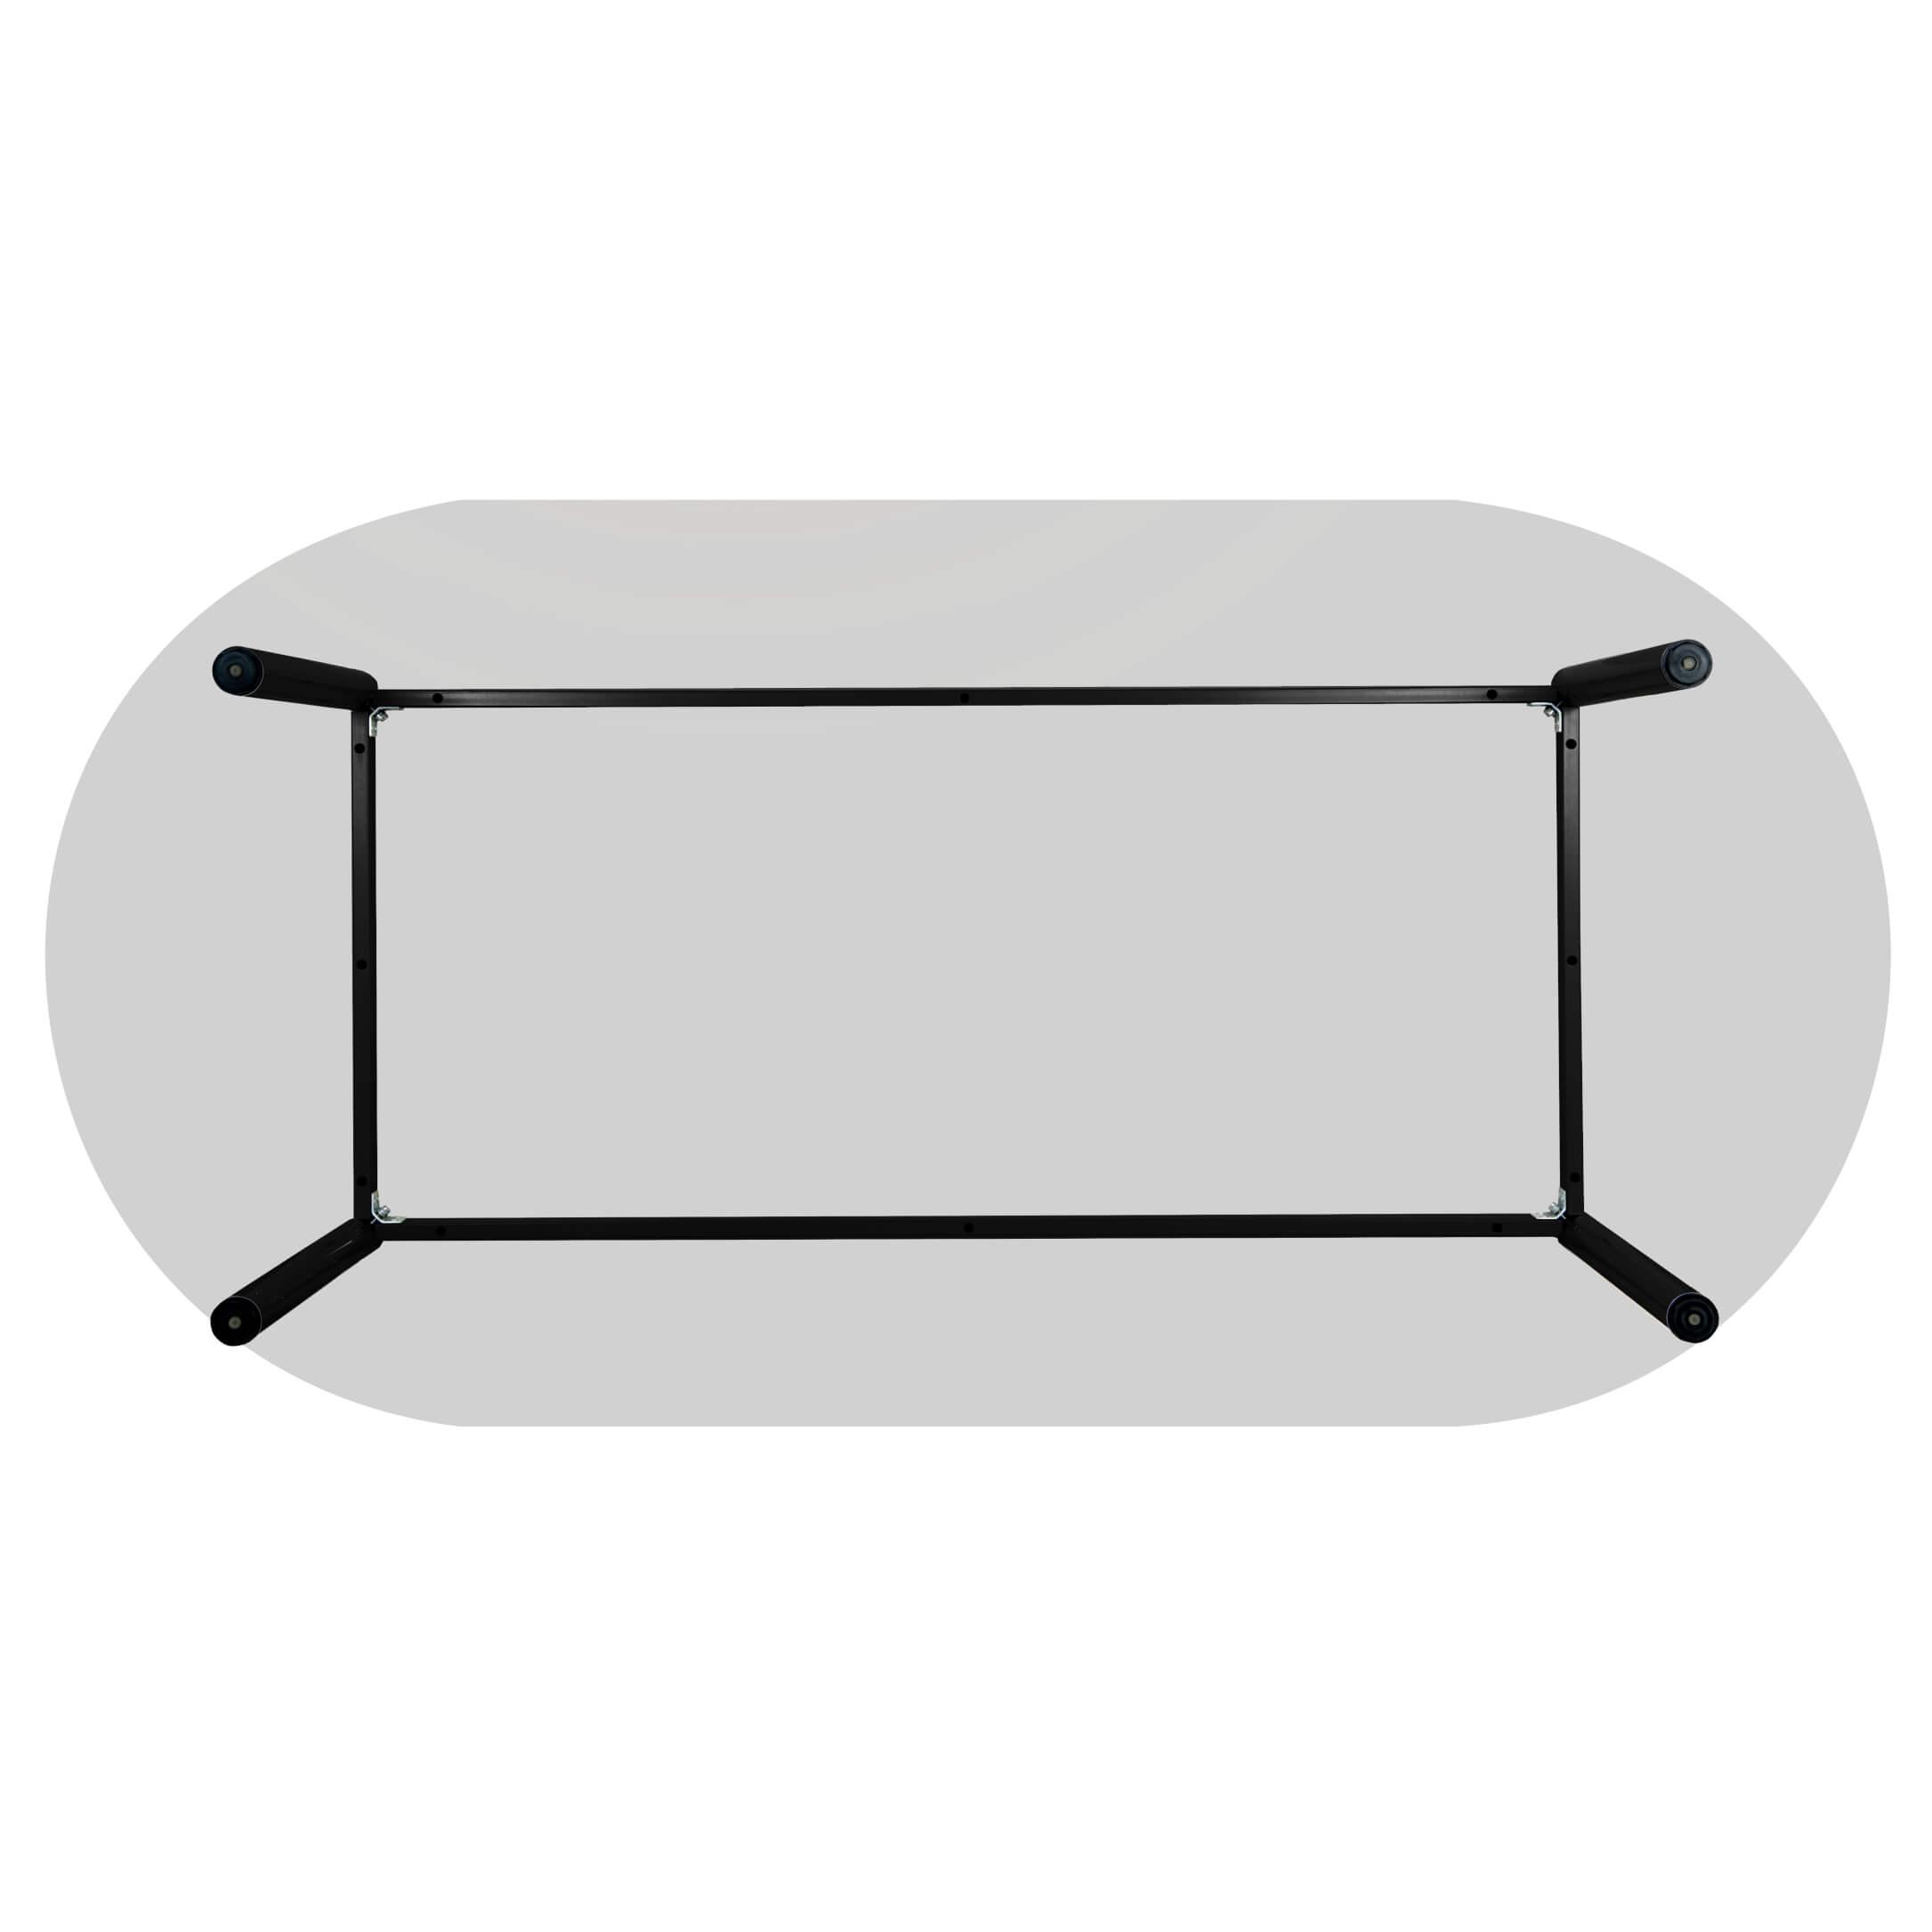 PROFI Besprechungstisch oval 240 x 100 cm OPTIMA 4-6 Pers. Konferenztisch Meetingtisch